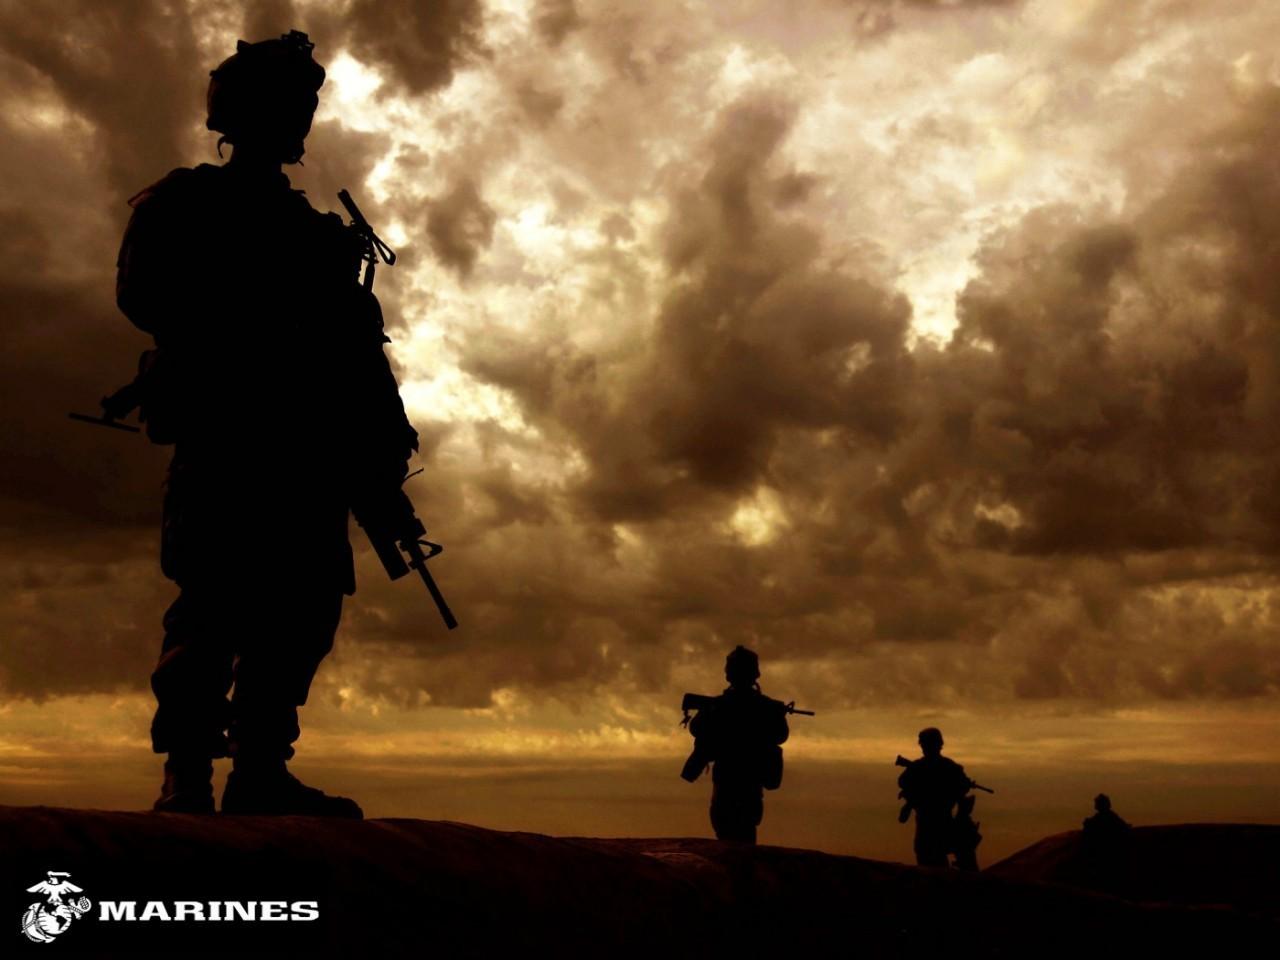 us army military 18954008 1280 960jpg 1280x960